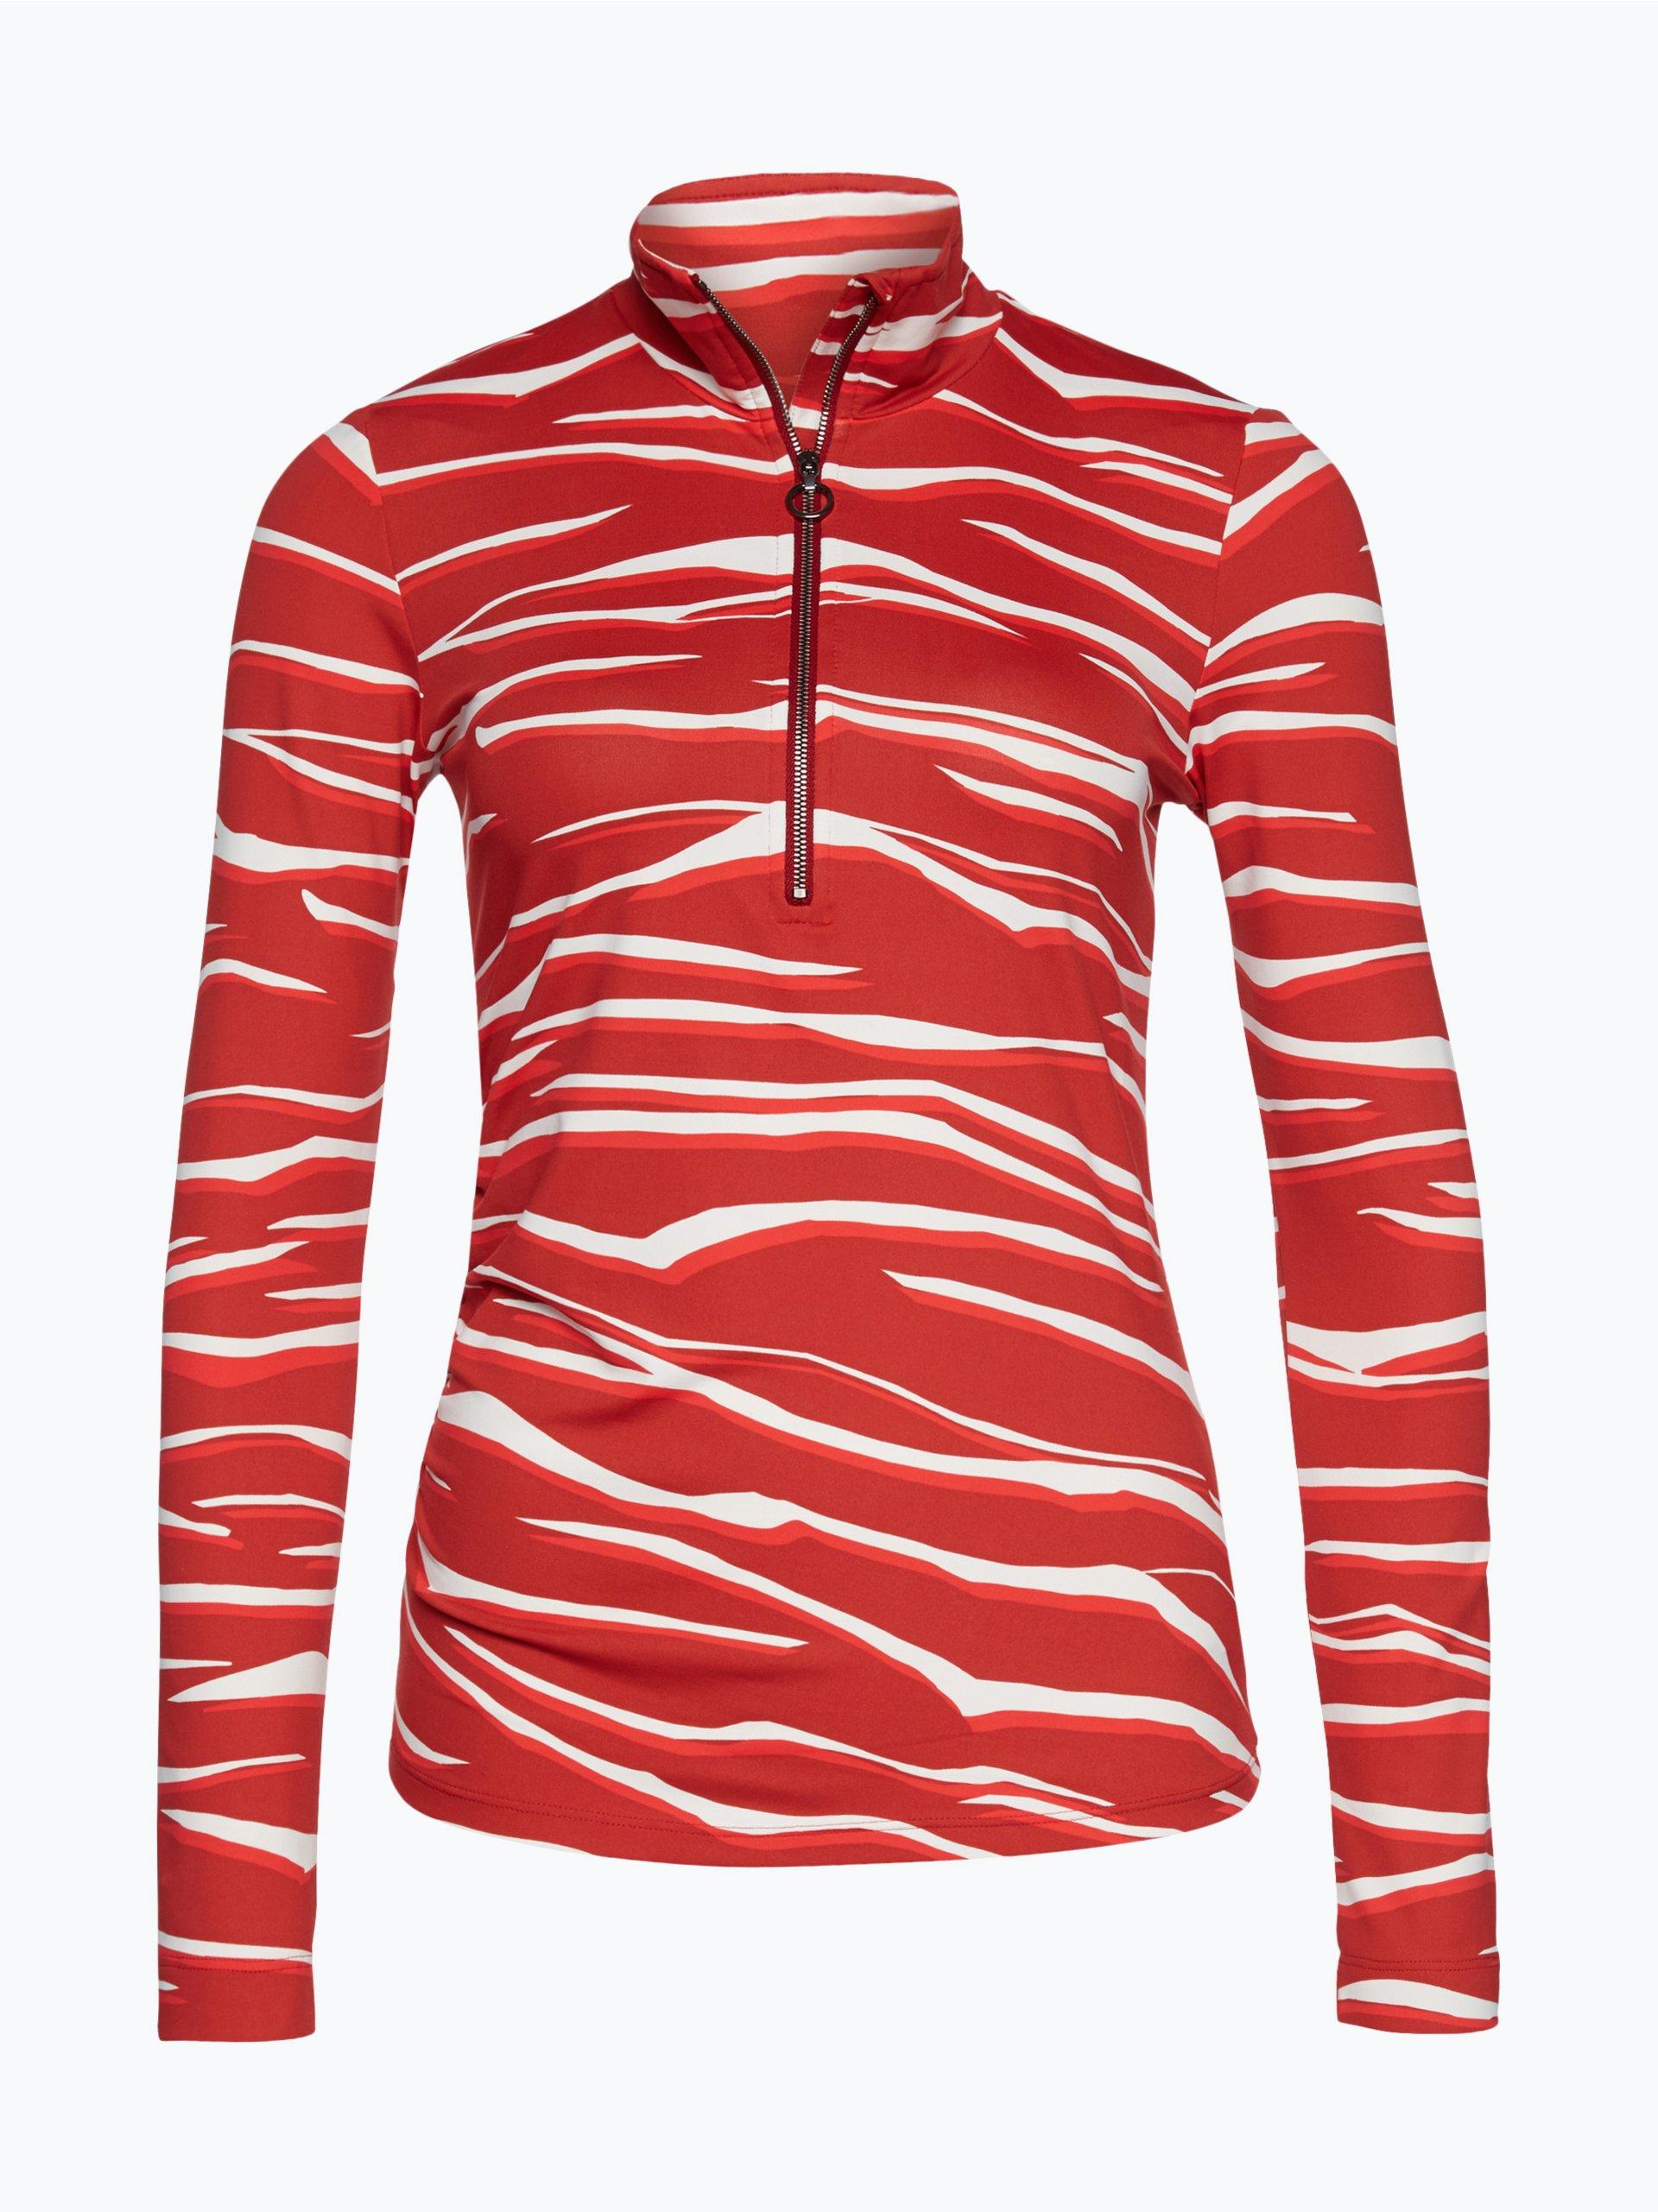 marc cain sports damen langarmshirt rot gemustert online kaufen peek und cloppenburg de. Black Bedroom Furniture Sets. Home Design Ideas